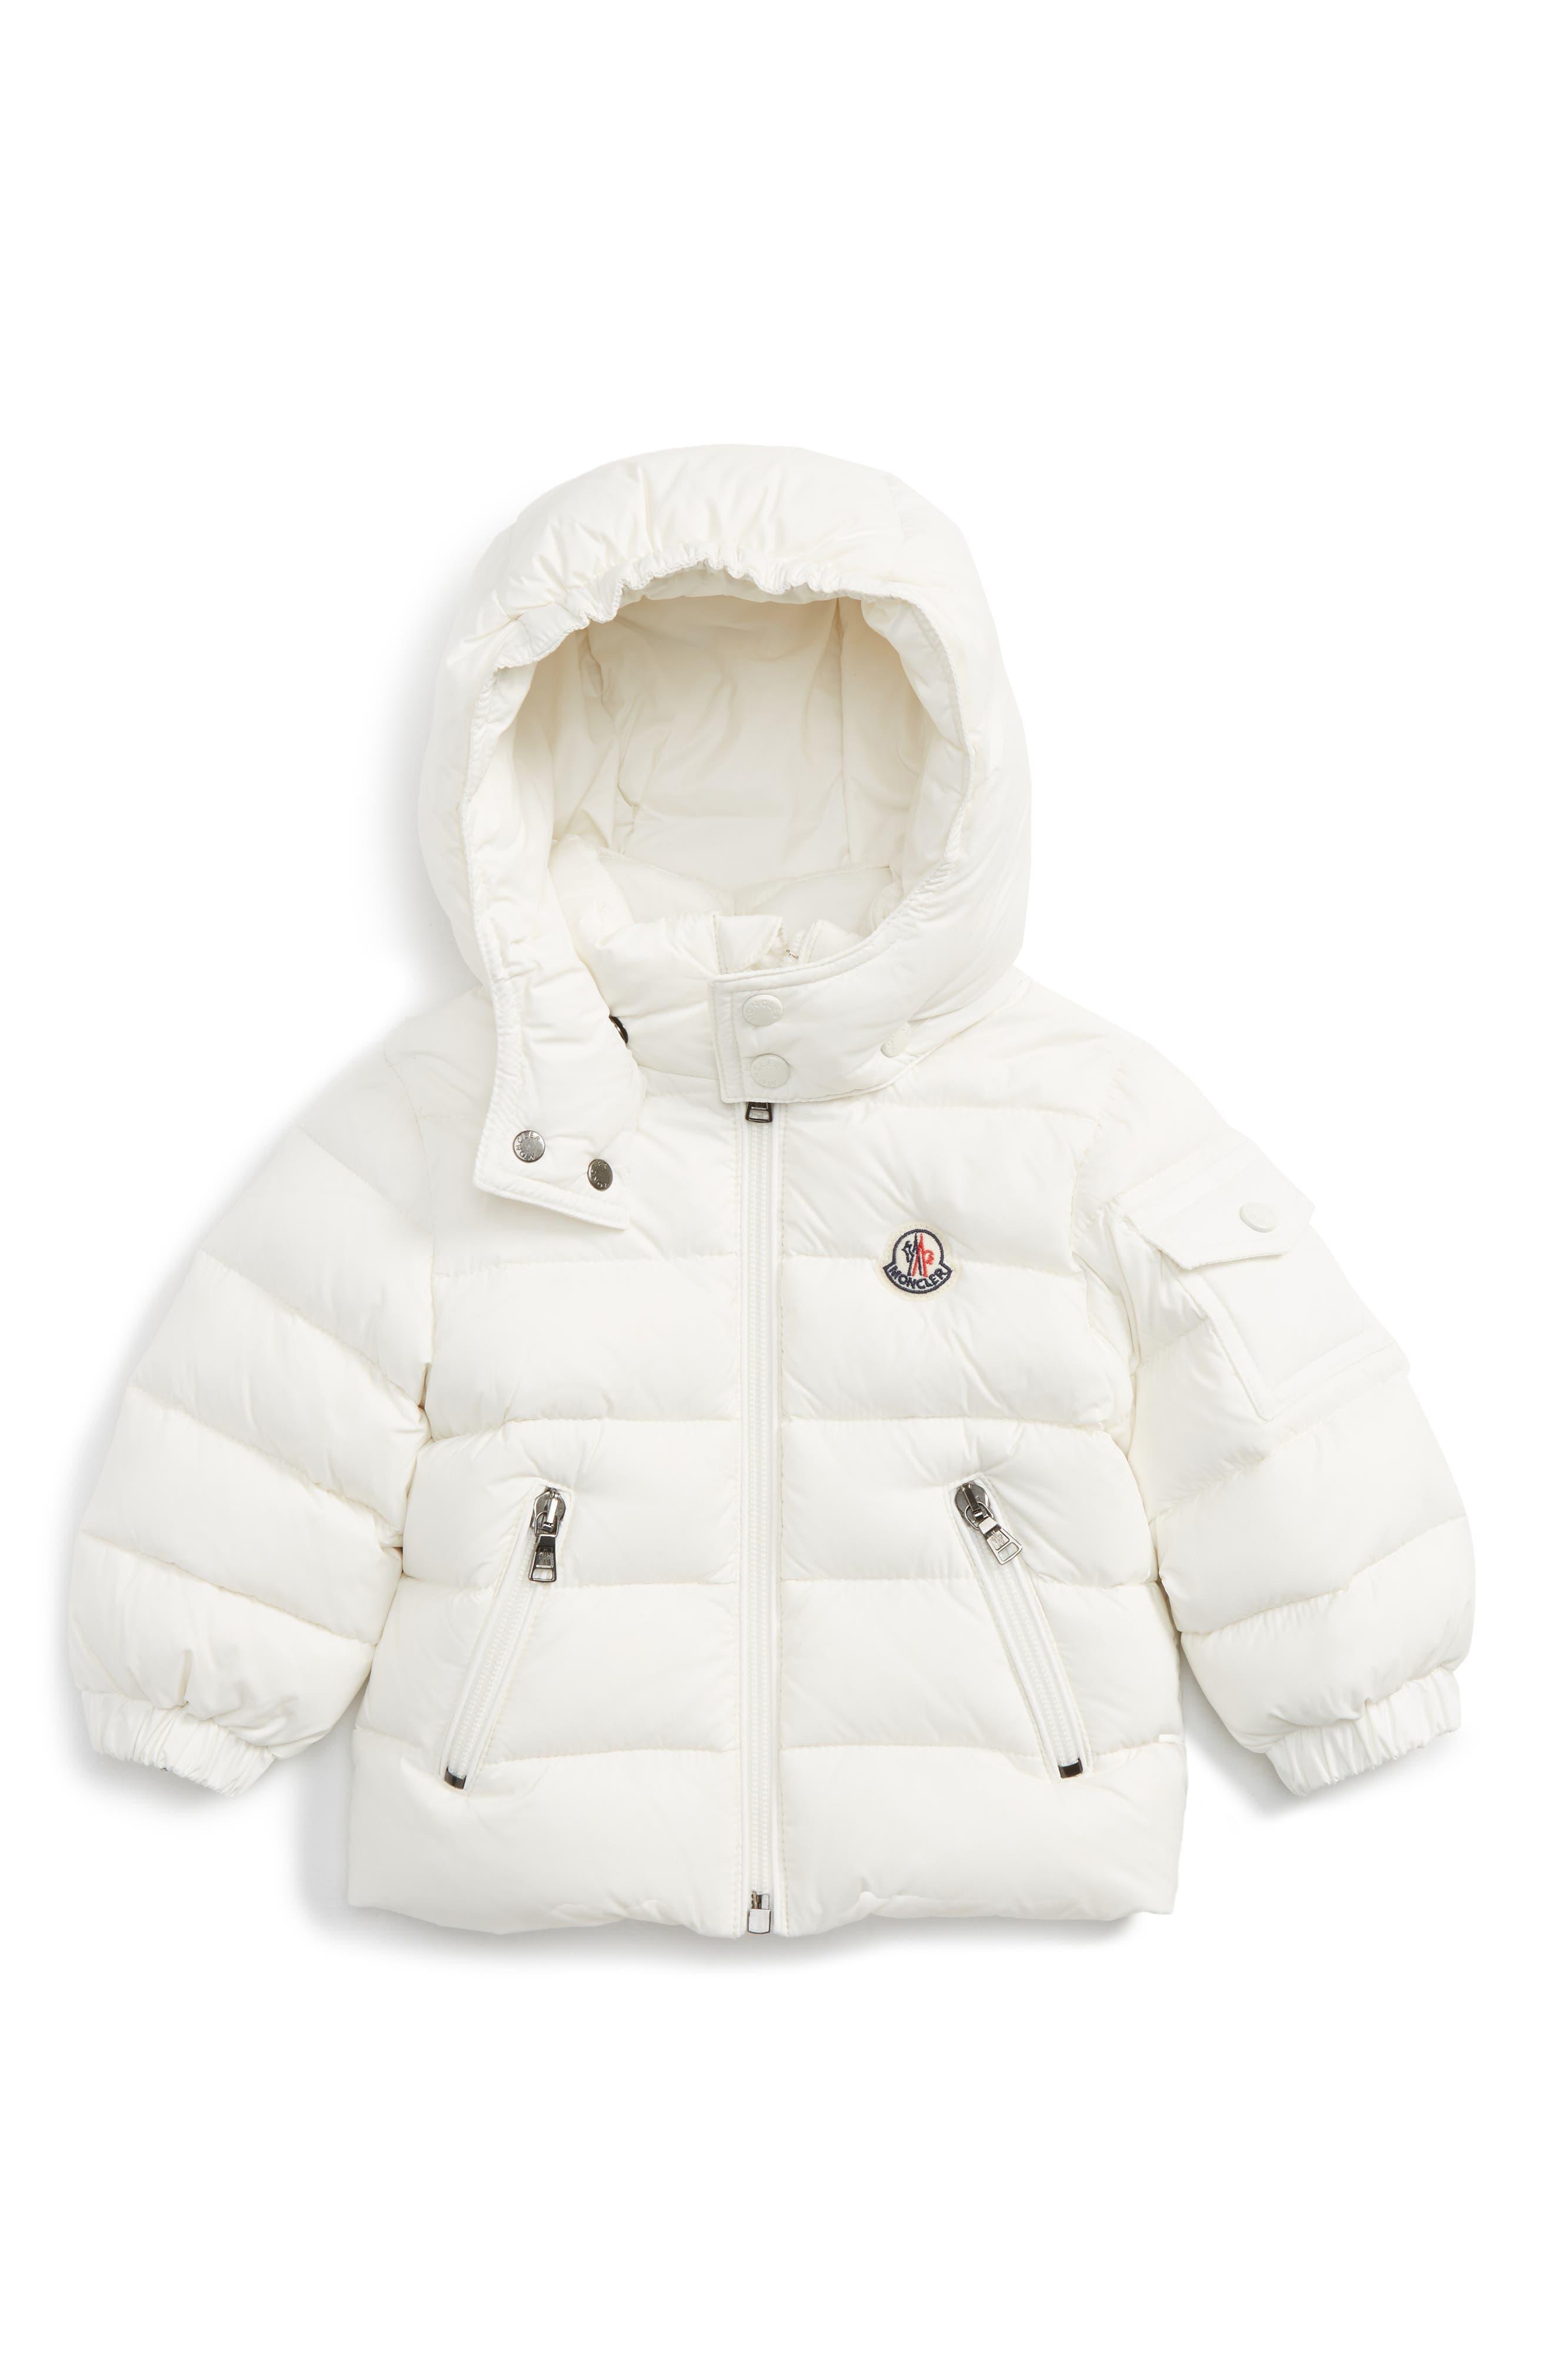 MONCLER Jules Water Resistant Down Jacket